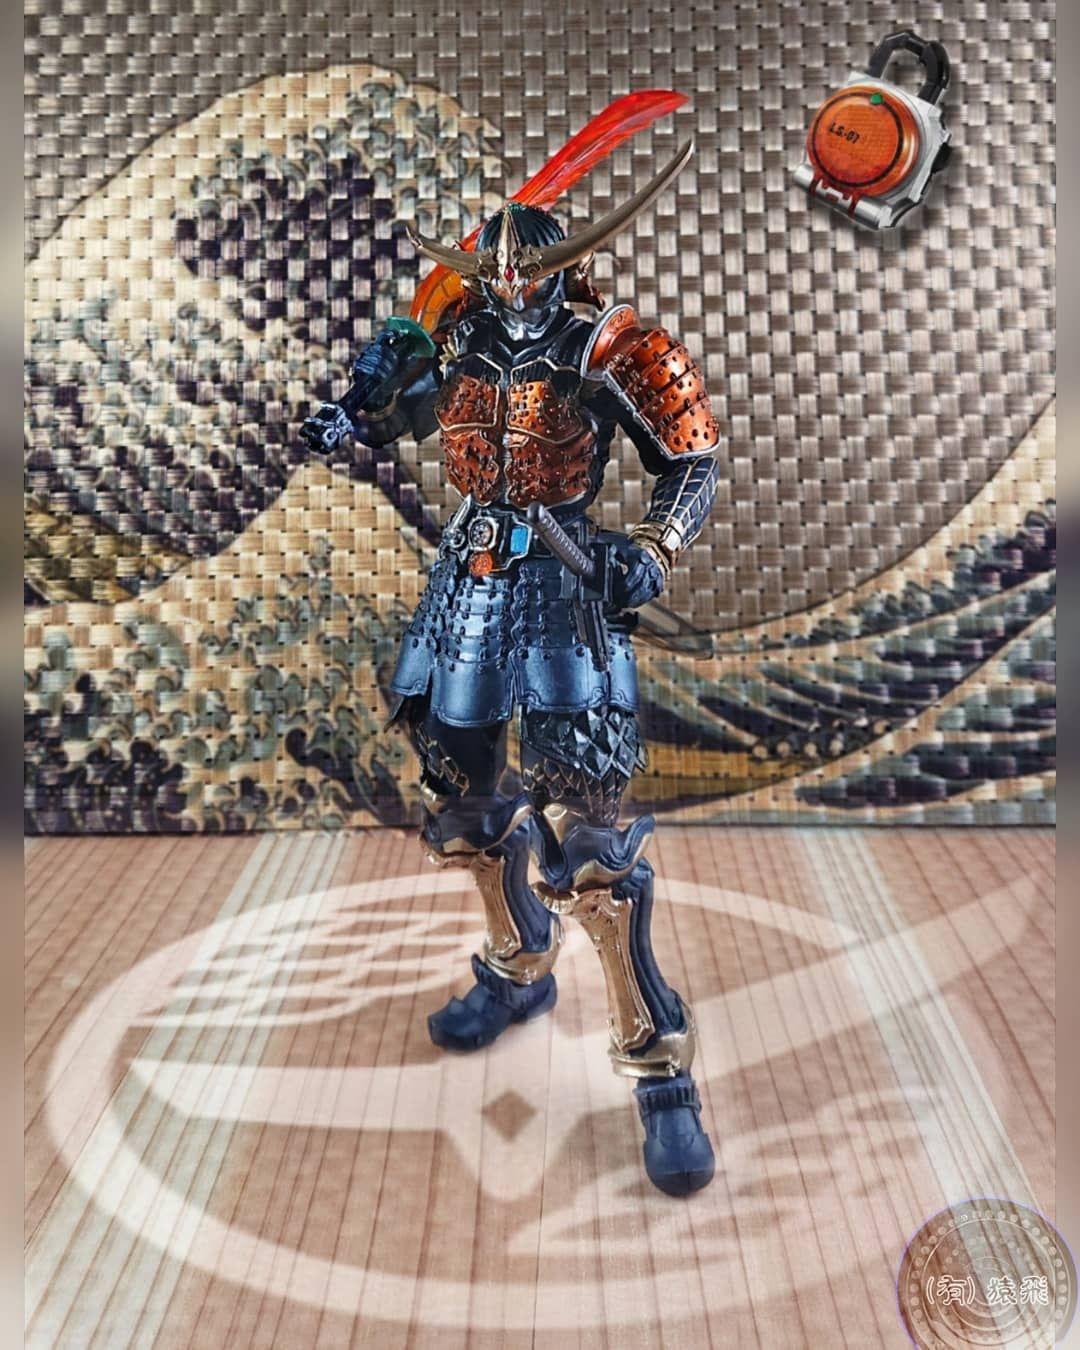 pin by jerry gearlds on s h figuarts and s i c figures samurai gear samurai sh figuarts